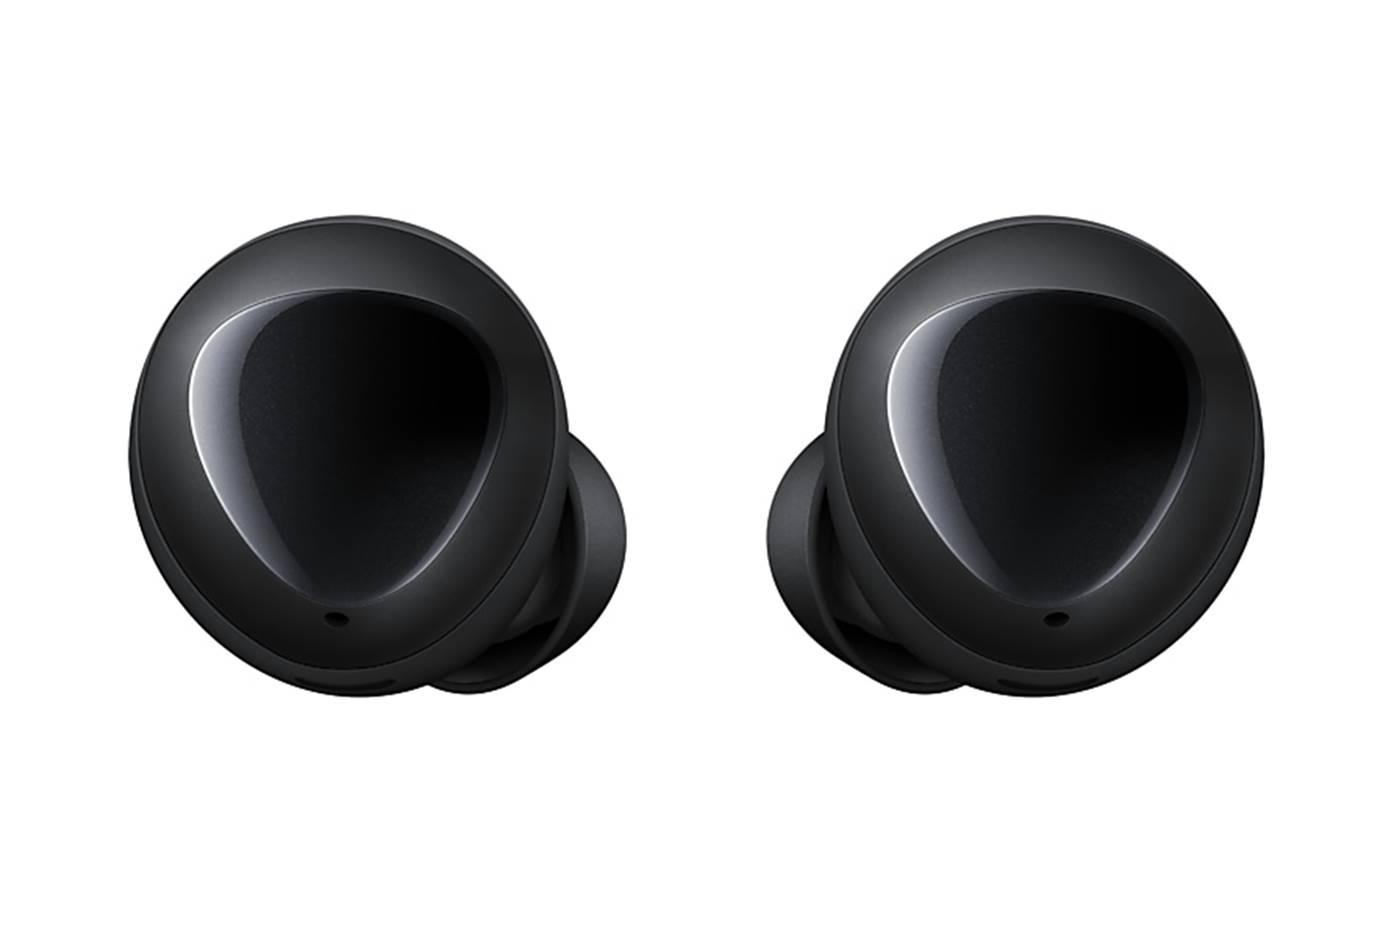 Samsung Galaxy Best Bass True Wireless Earbuds